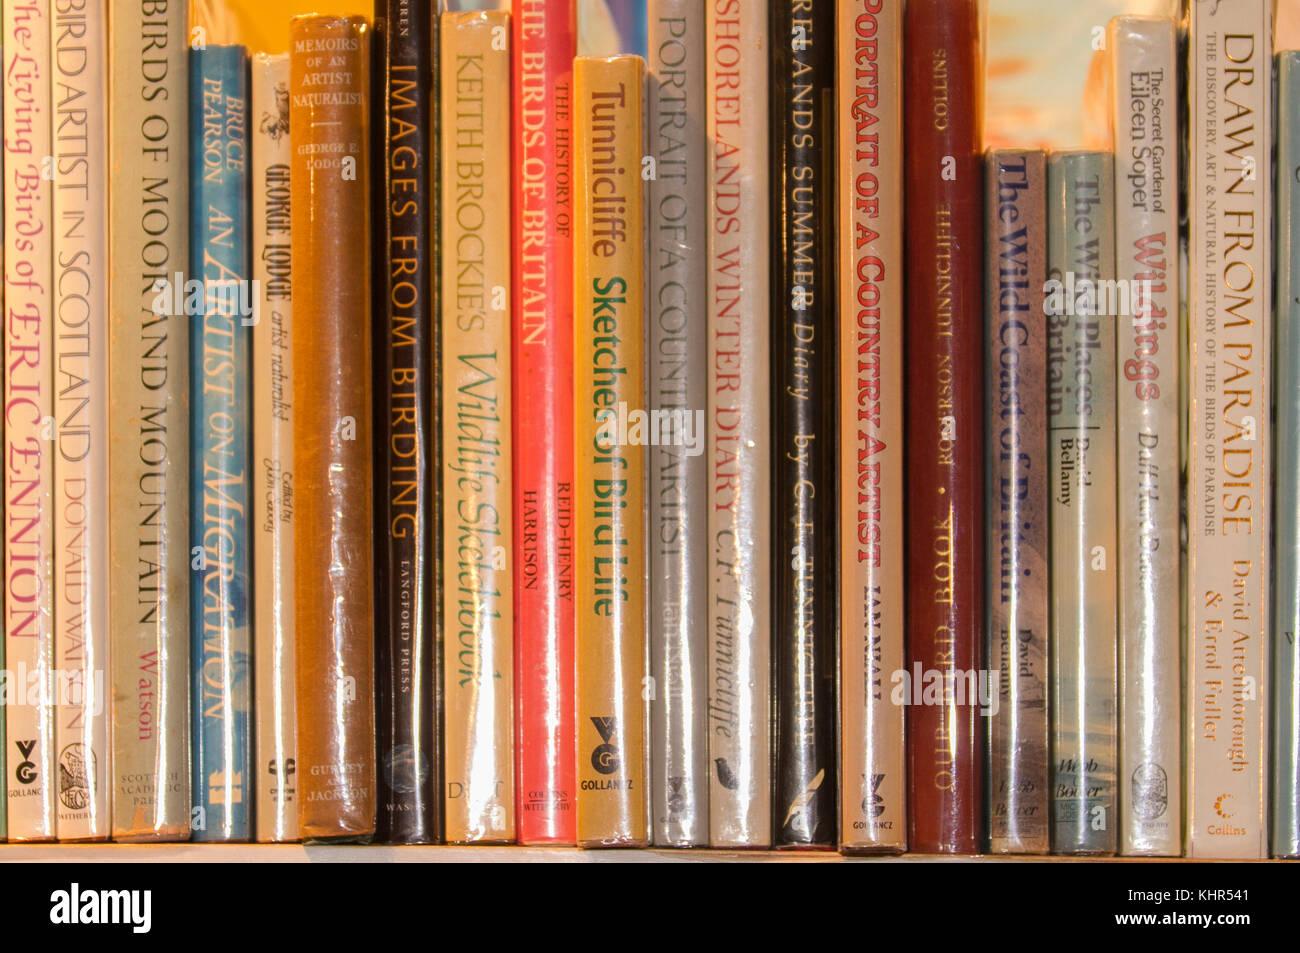 History Books Shelves Stock Photos \u0026 History Books Shelves Stock ...